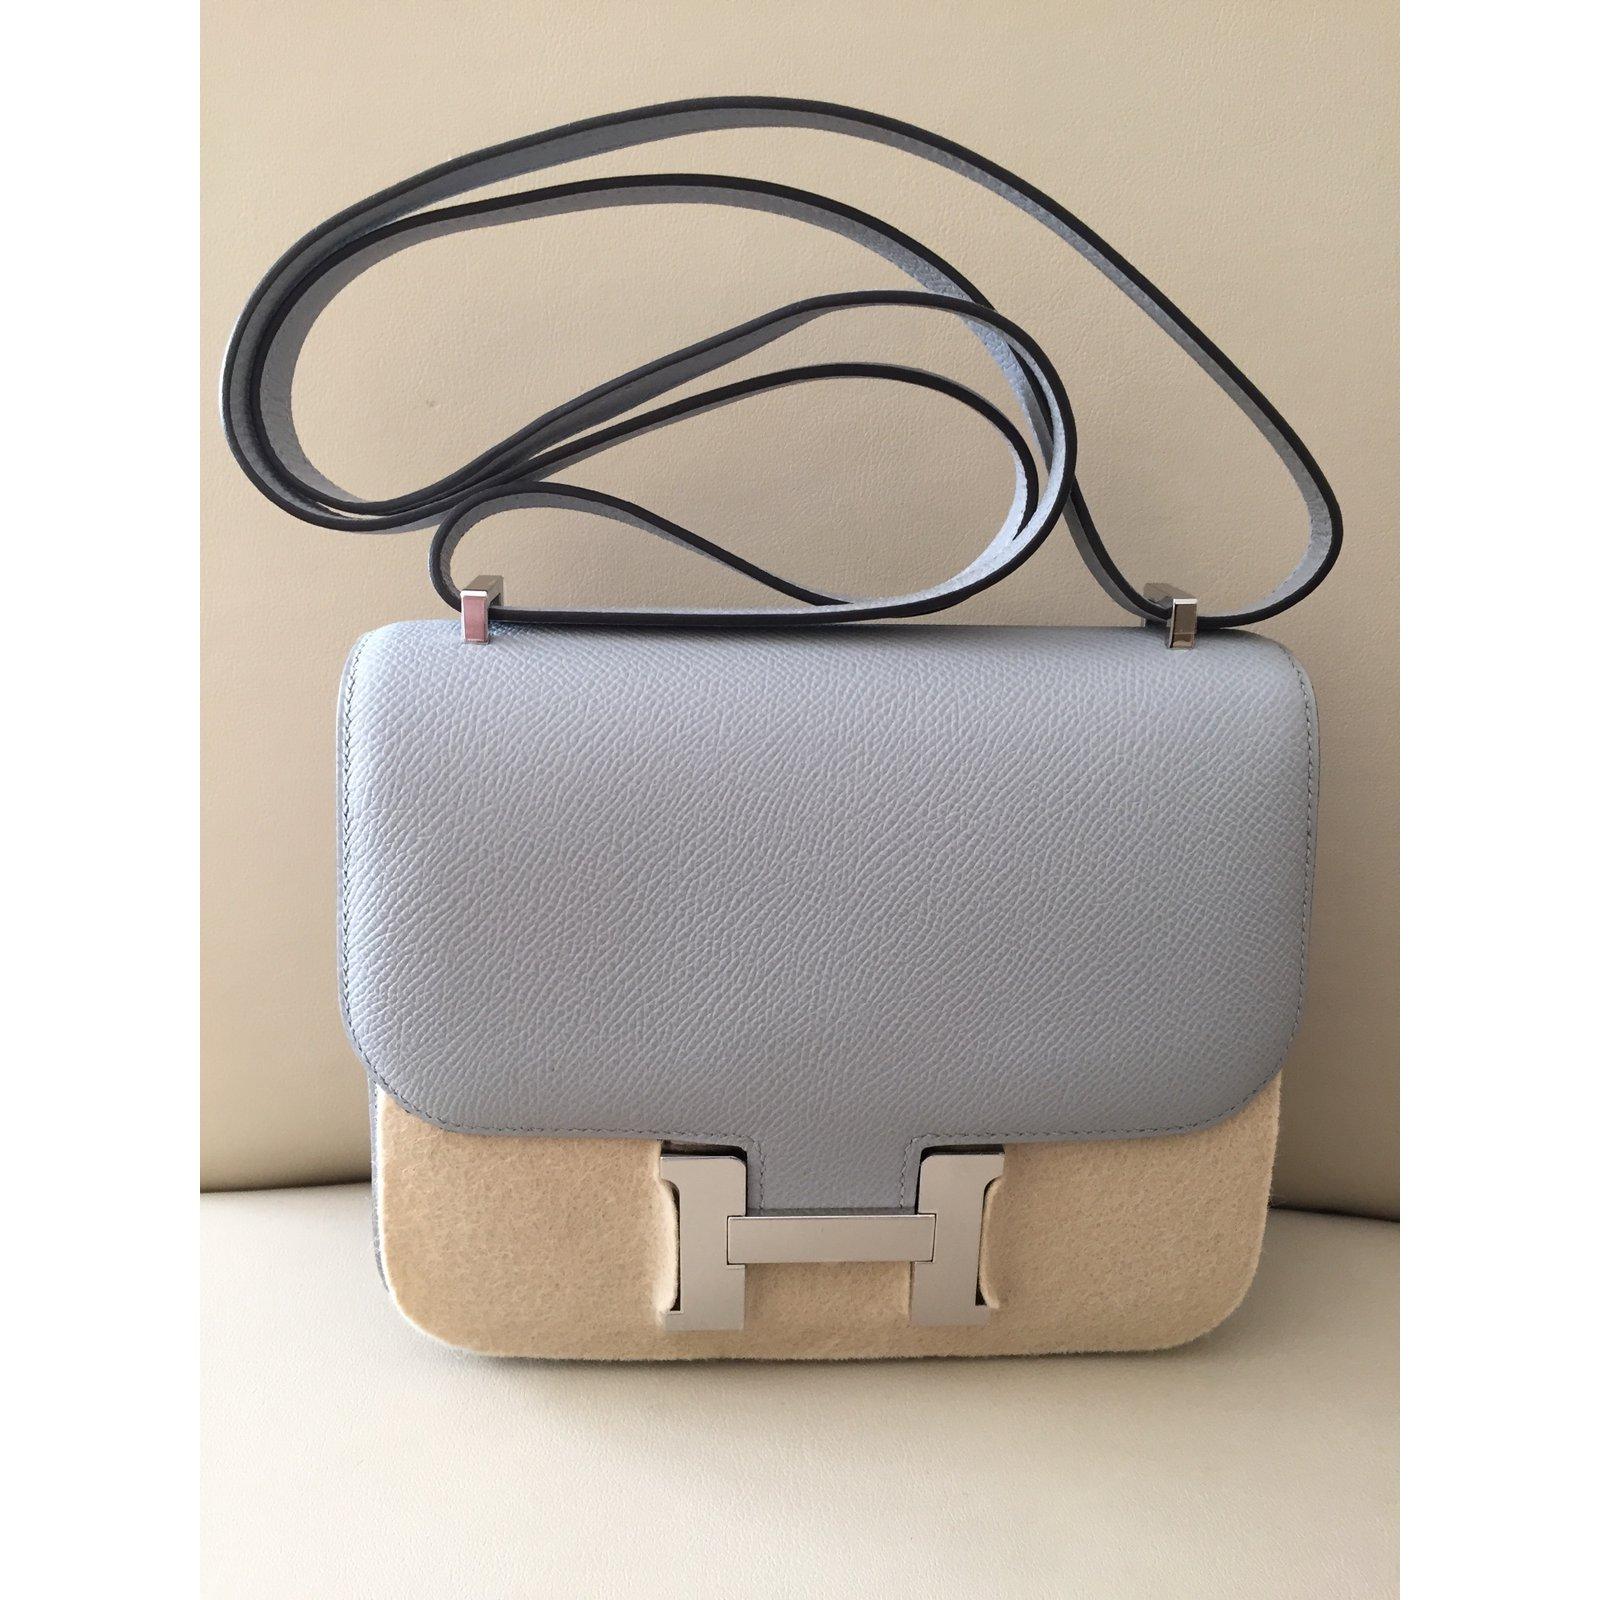 0199b7844e Facebook · Pin This. Hermès Constance Mini 18 Handbags Leather Blue ref .16695